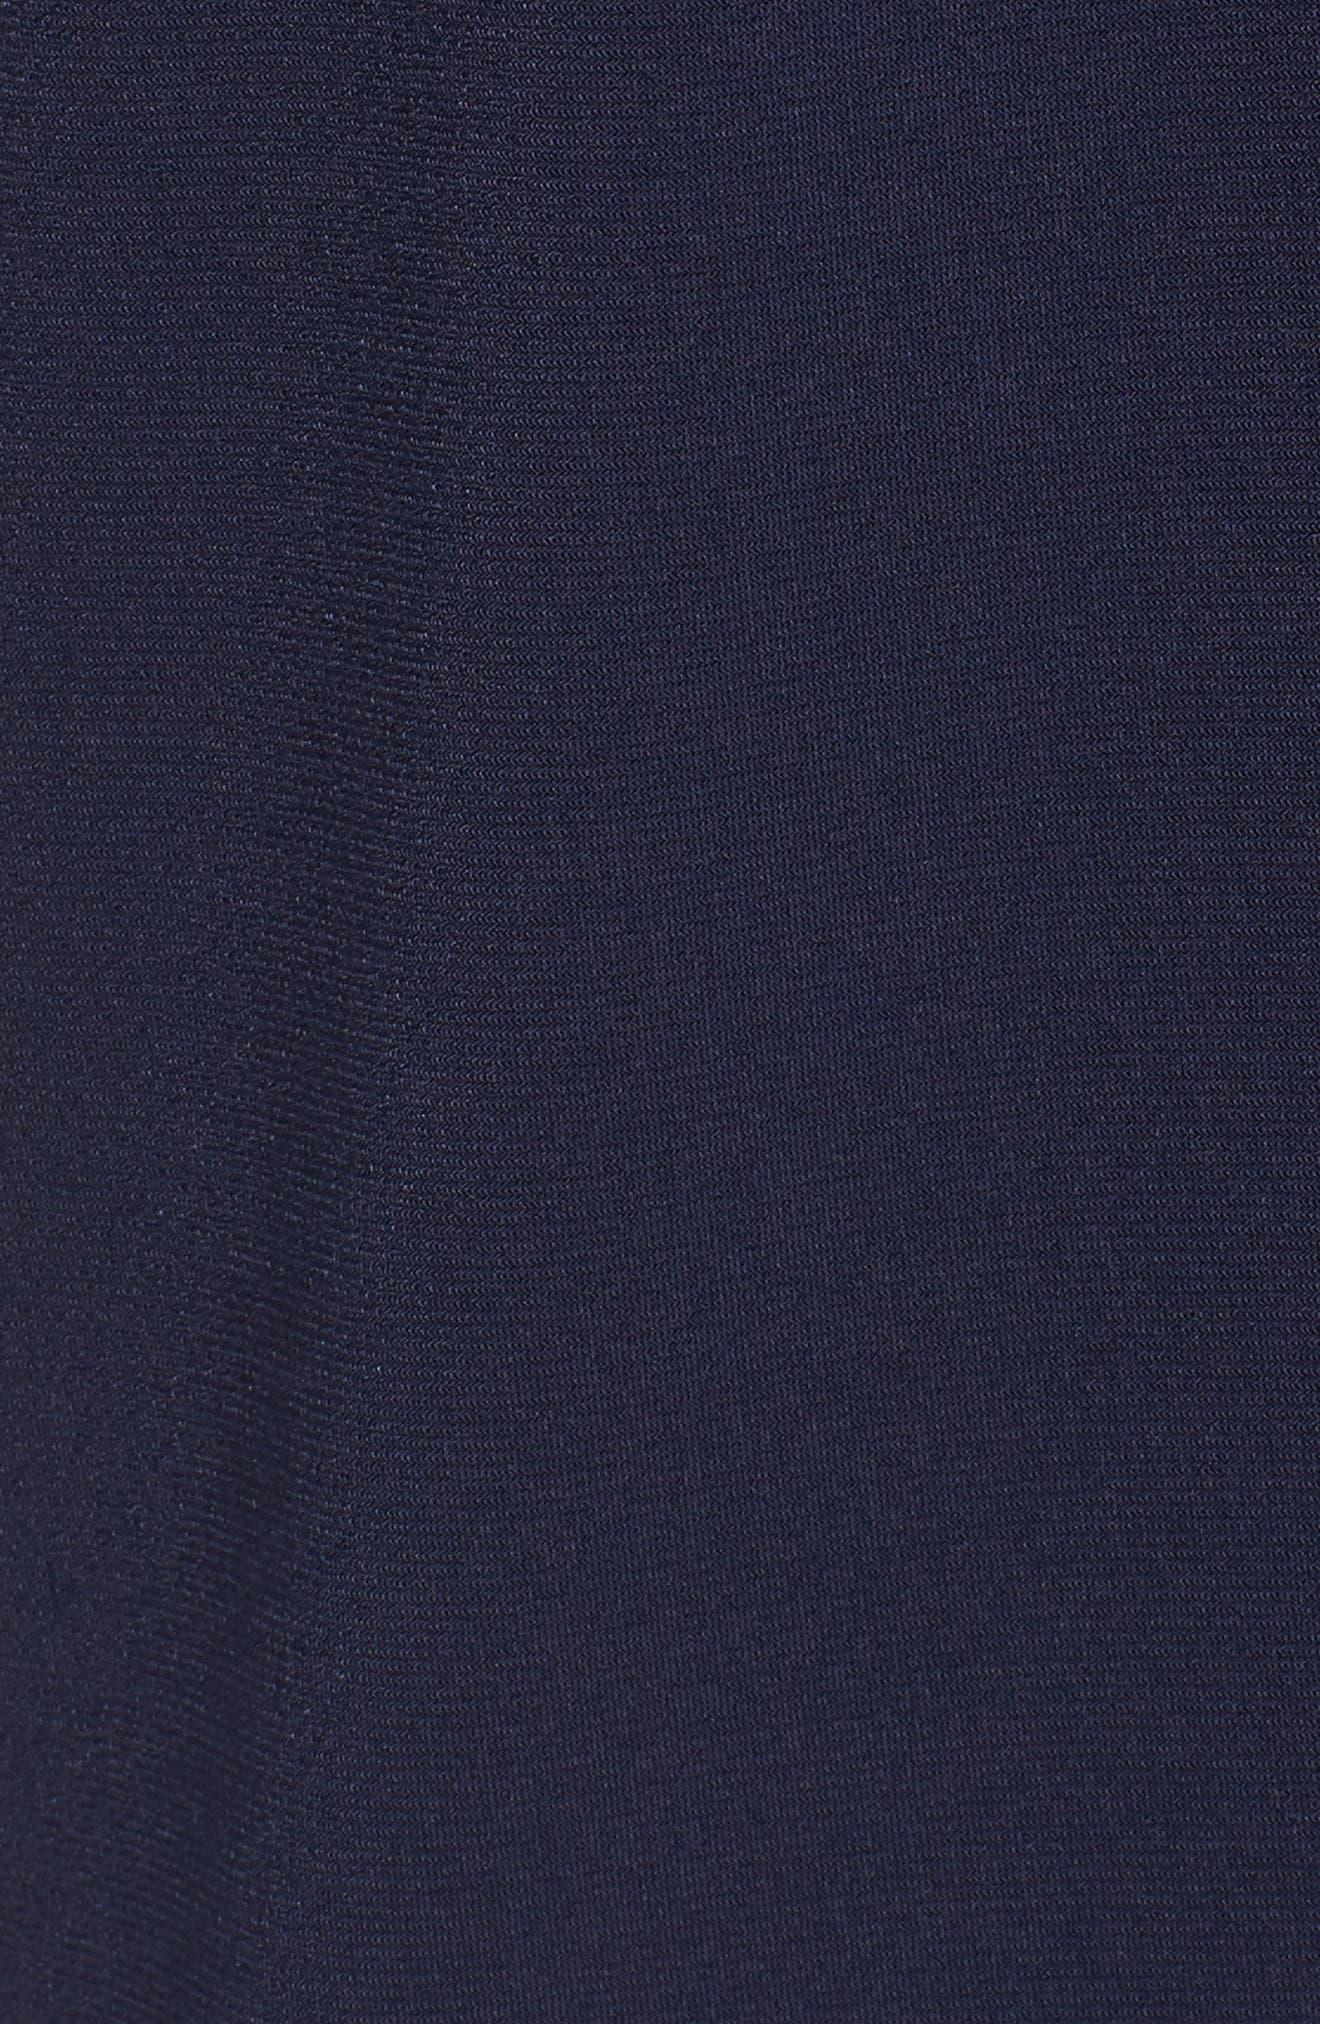 Off the Shoulder Crop Jumpsuit,                             Alternate thumbnail 5, color,                             True Navy